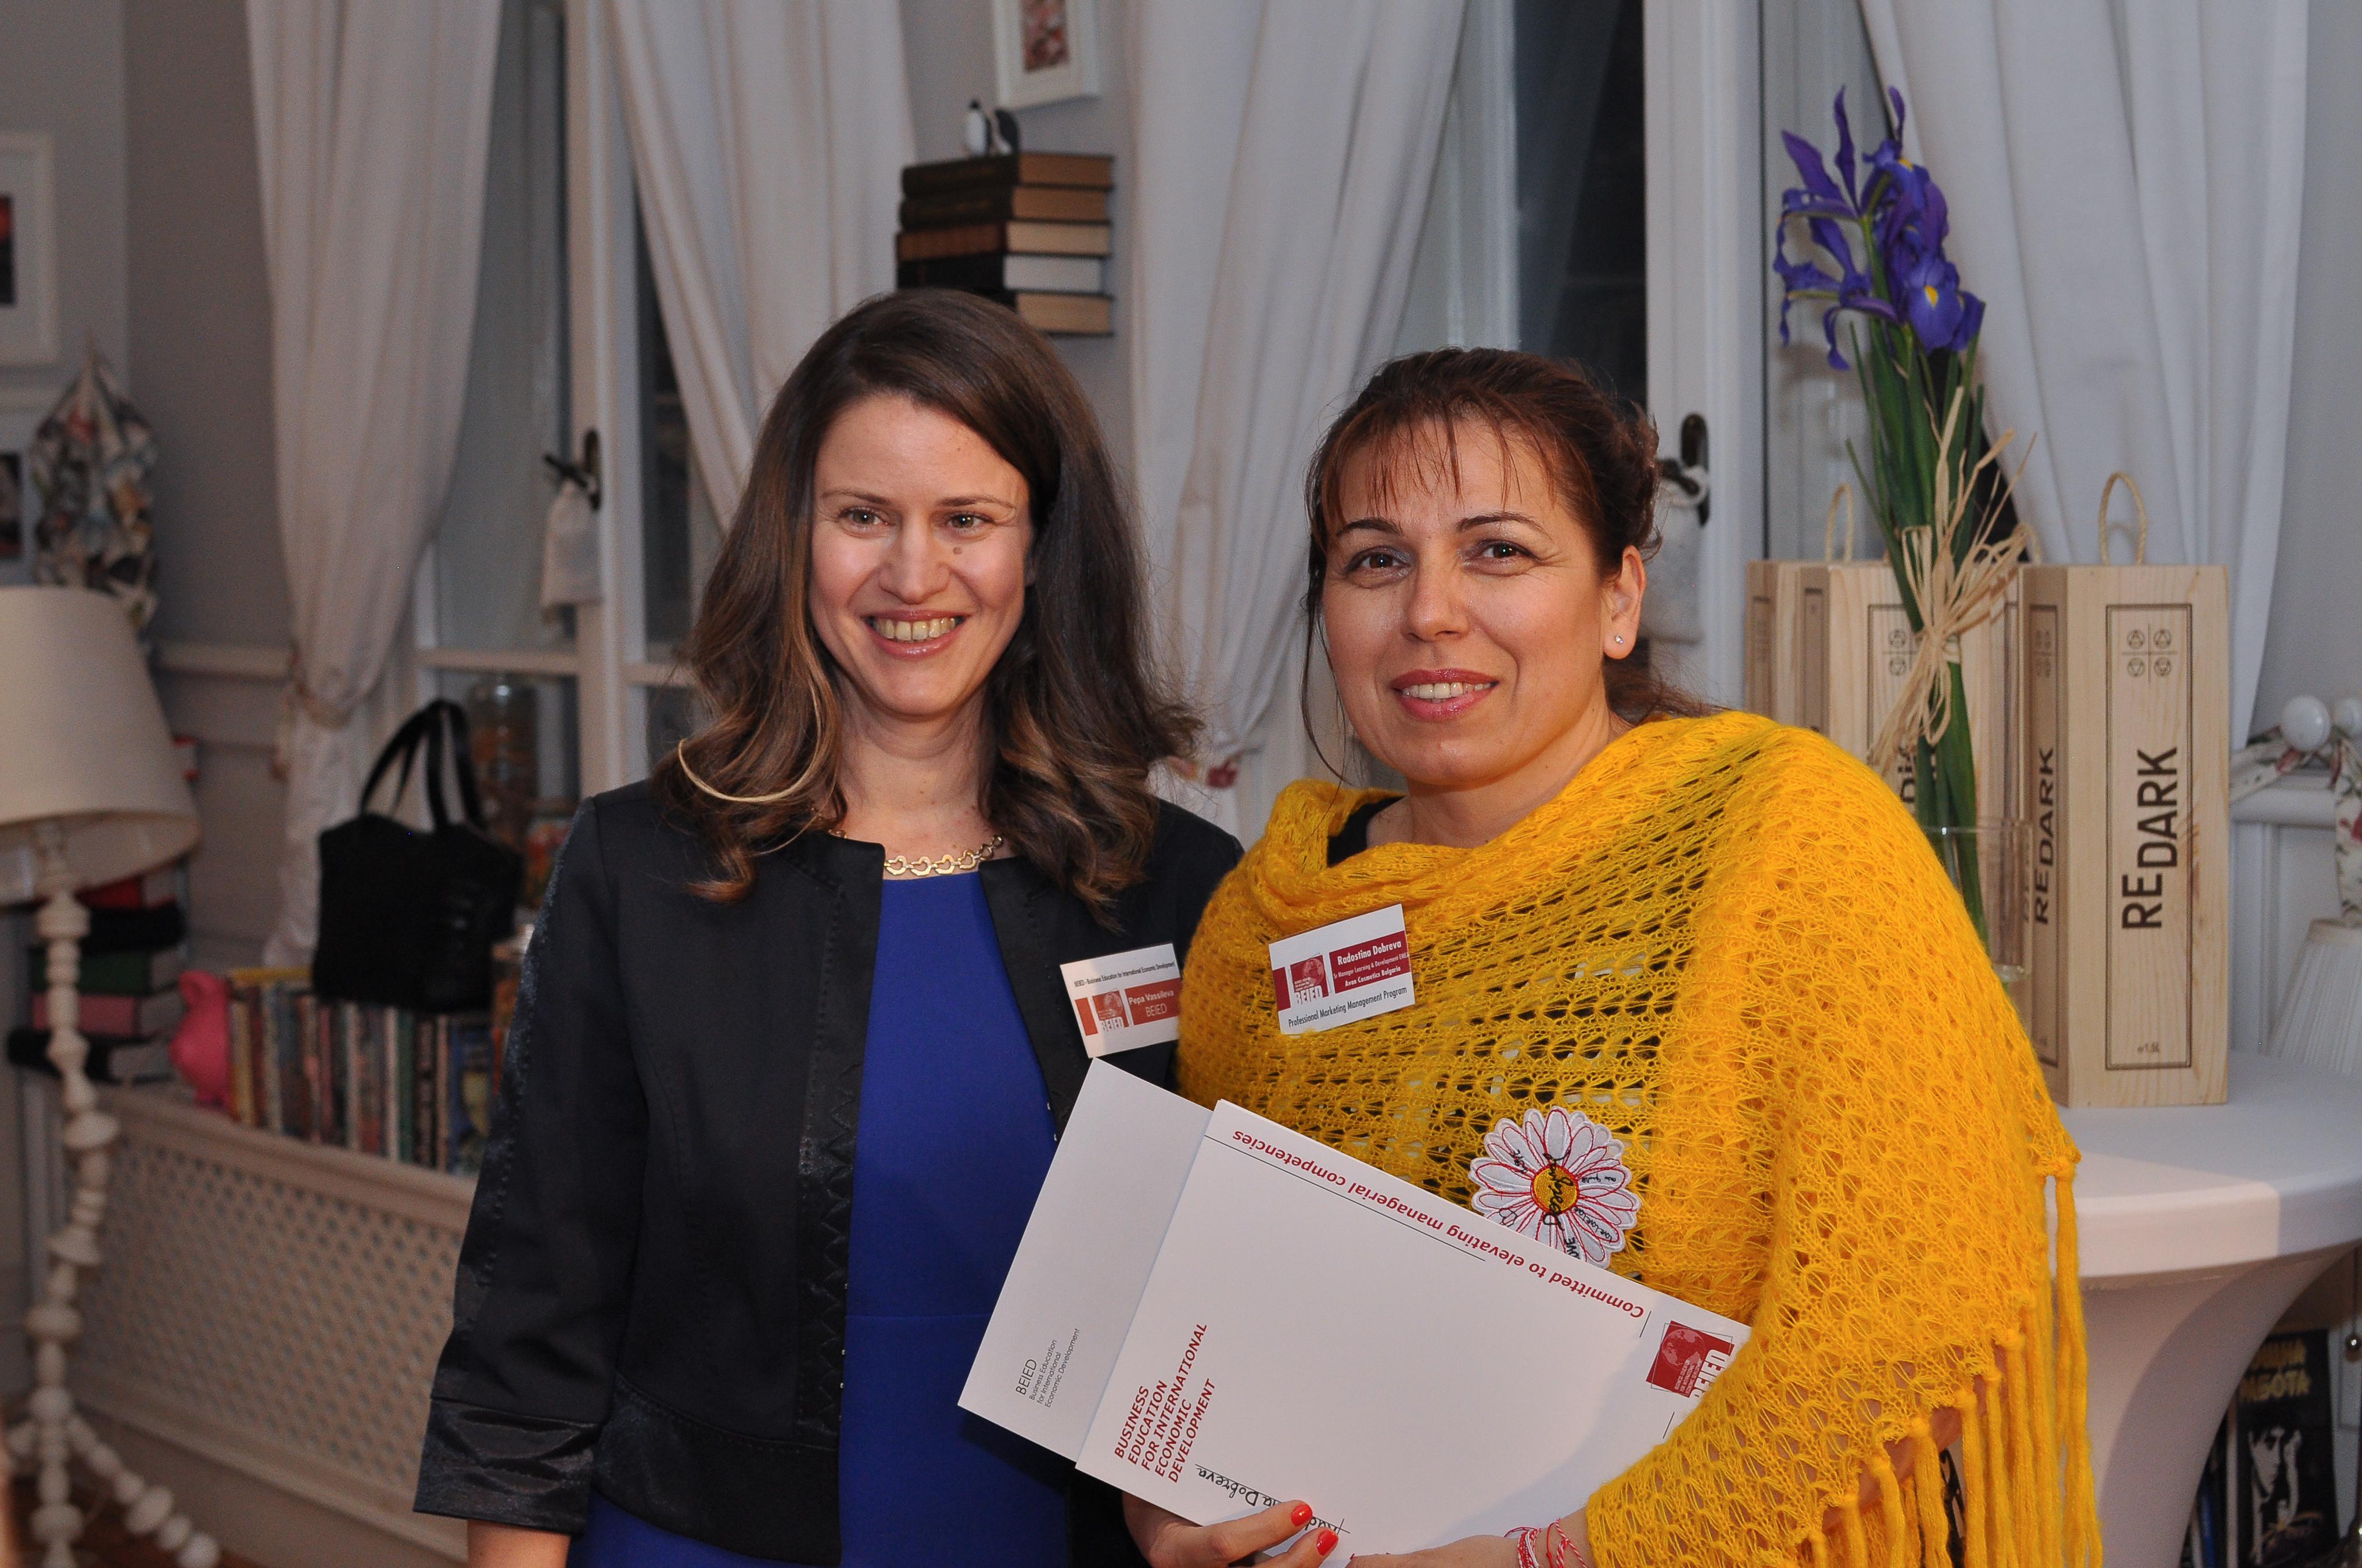 Radostina Dobreva SrManager Learning and Development EMEA Avon Cosmetics Bulgaria